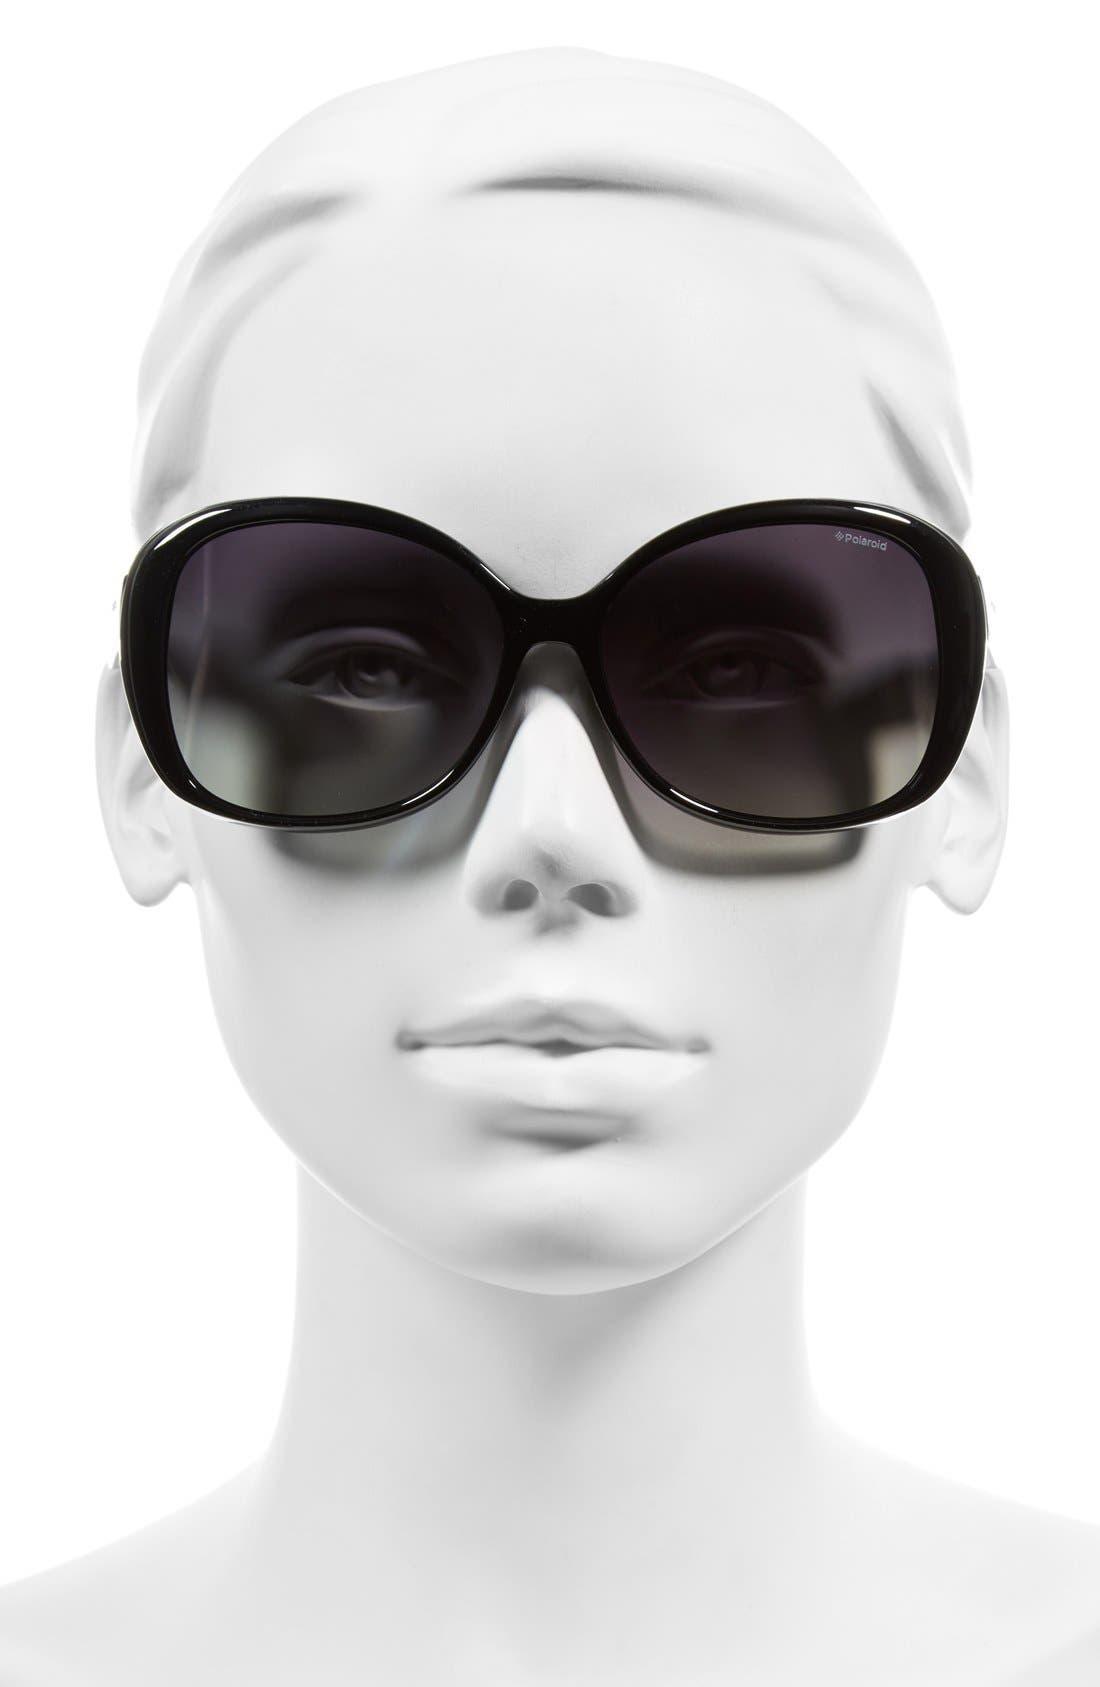 59mm Polarized Sunglasses,                             Alternate thumbnail 2, color,                             Shiny Black/ Green Polarized